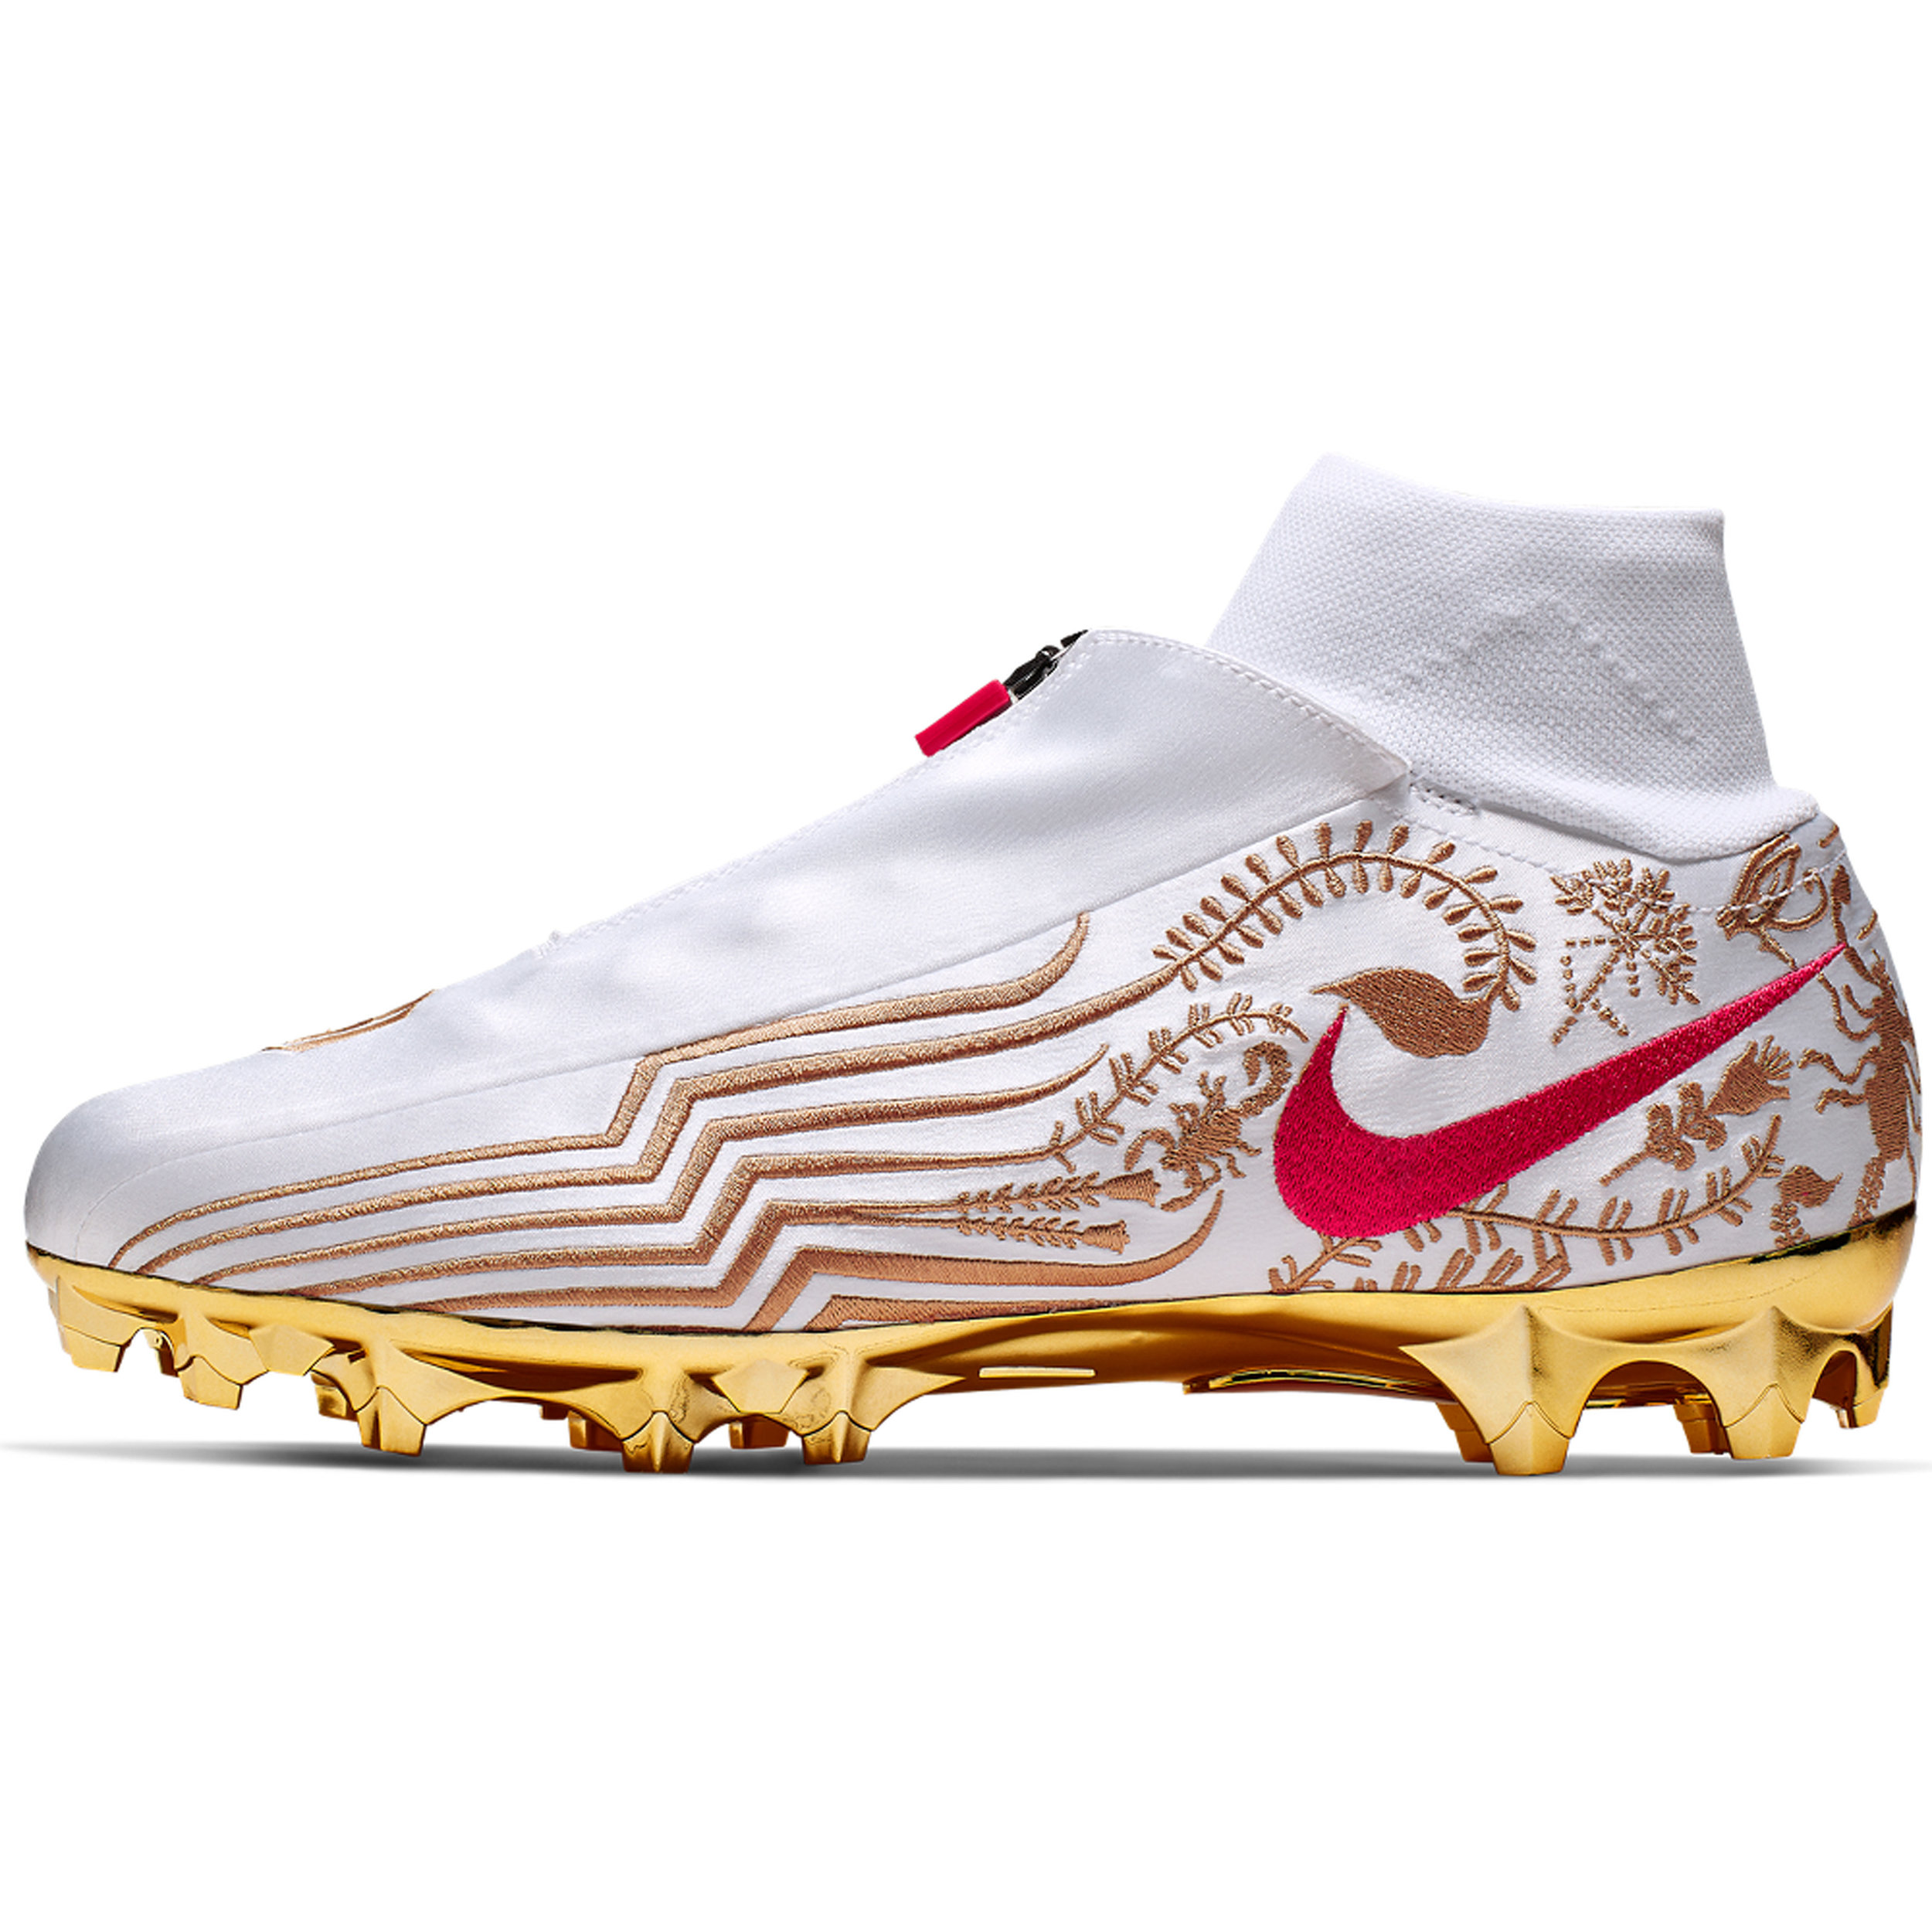 NikeNews_NikeVaporUntouchablePro3_OBJ_04_89291.jpg